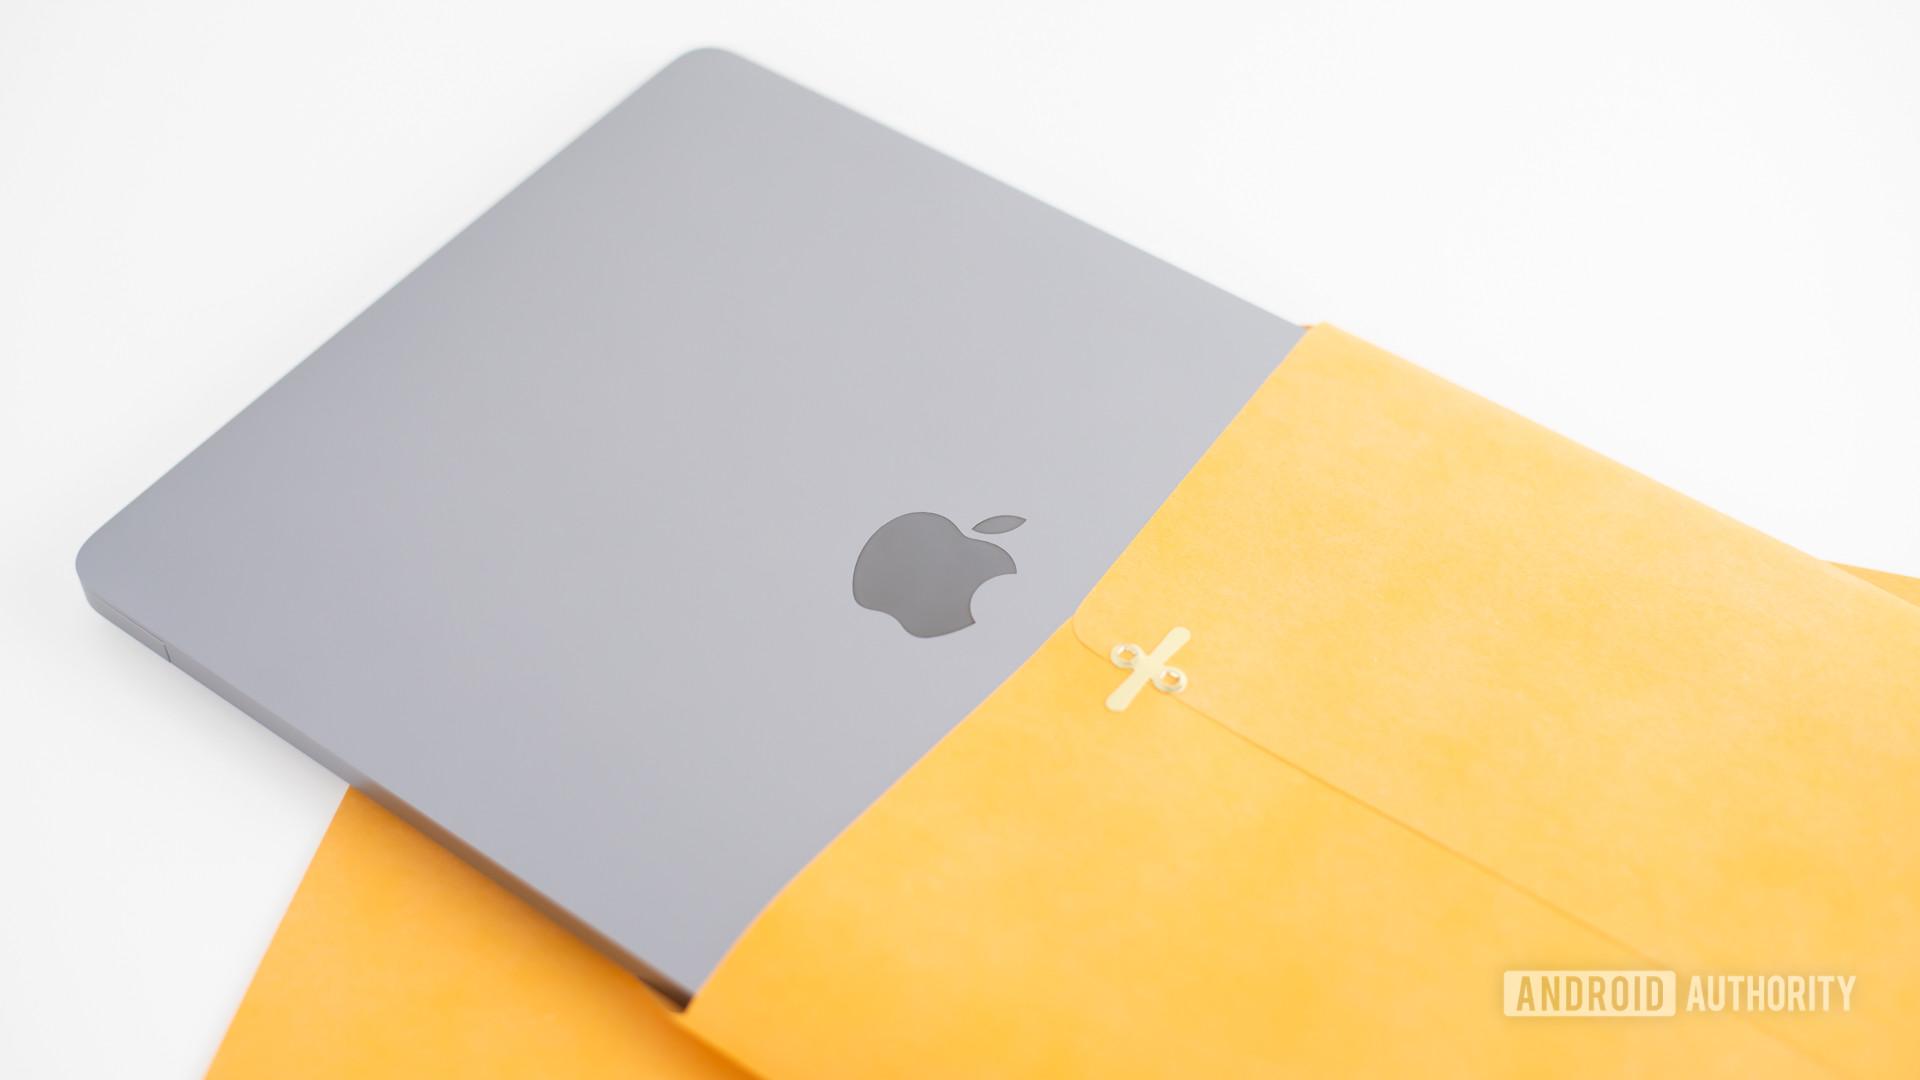 2020 MacBook Air review laptop inside manila envelope2